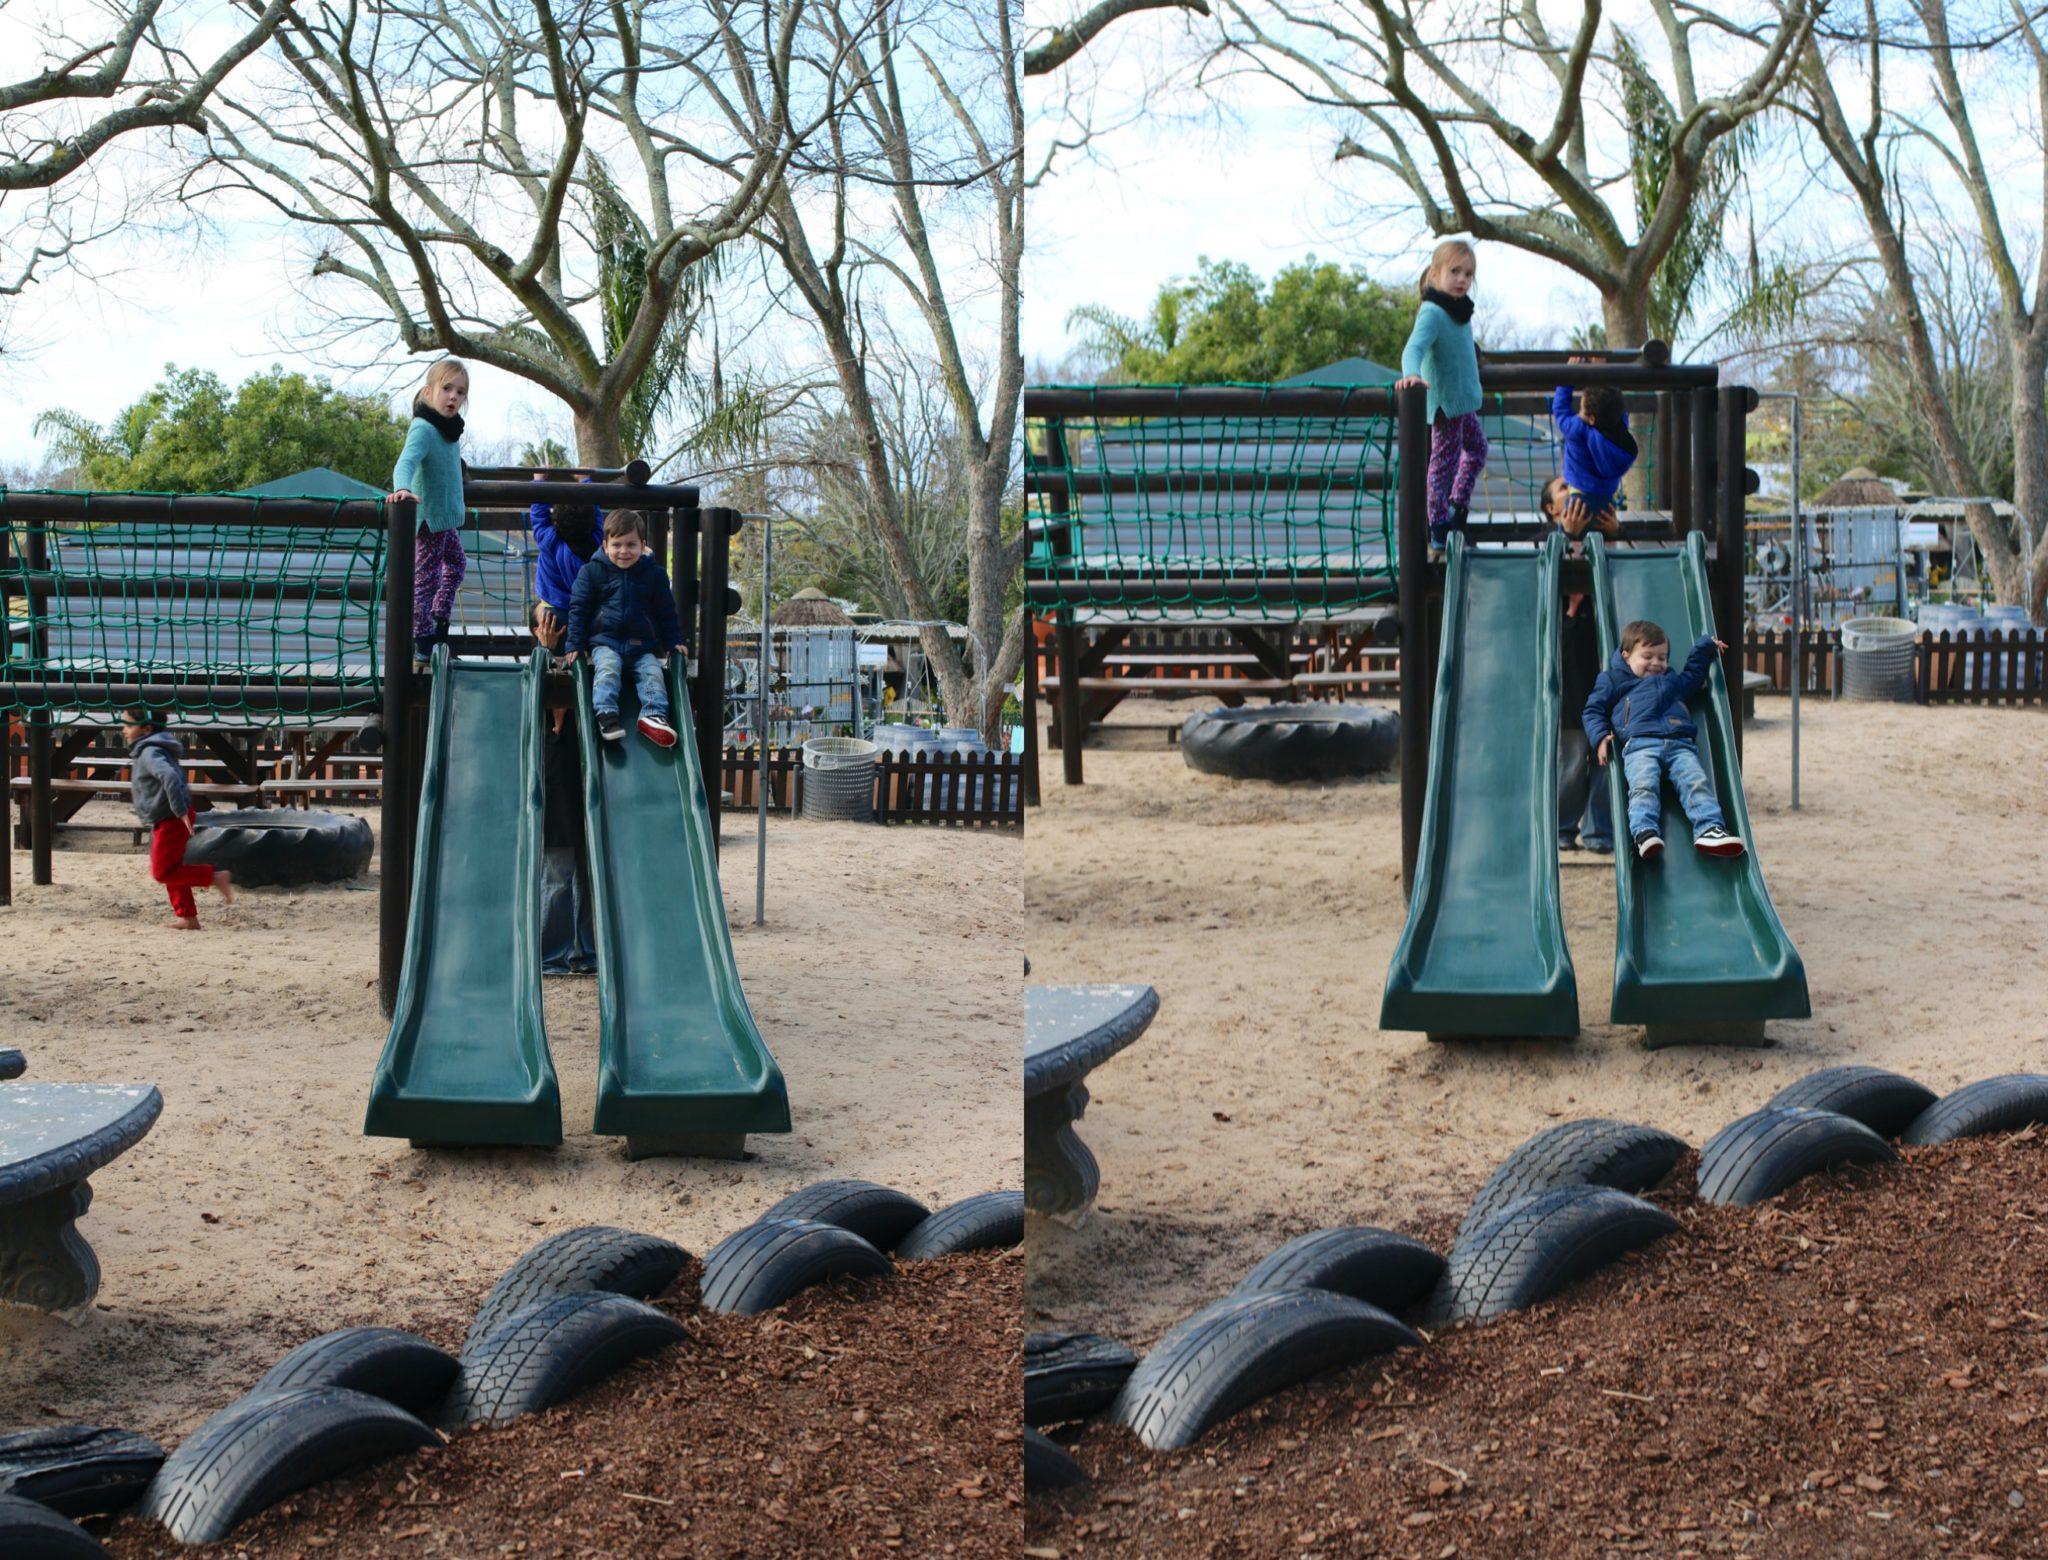 stodels playground